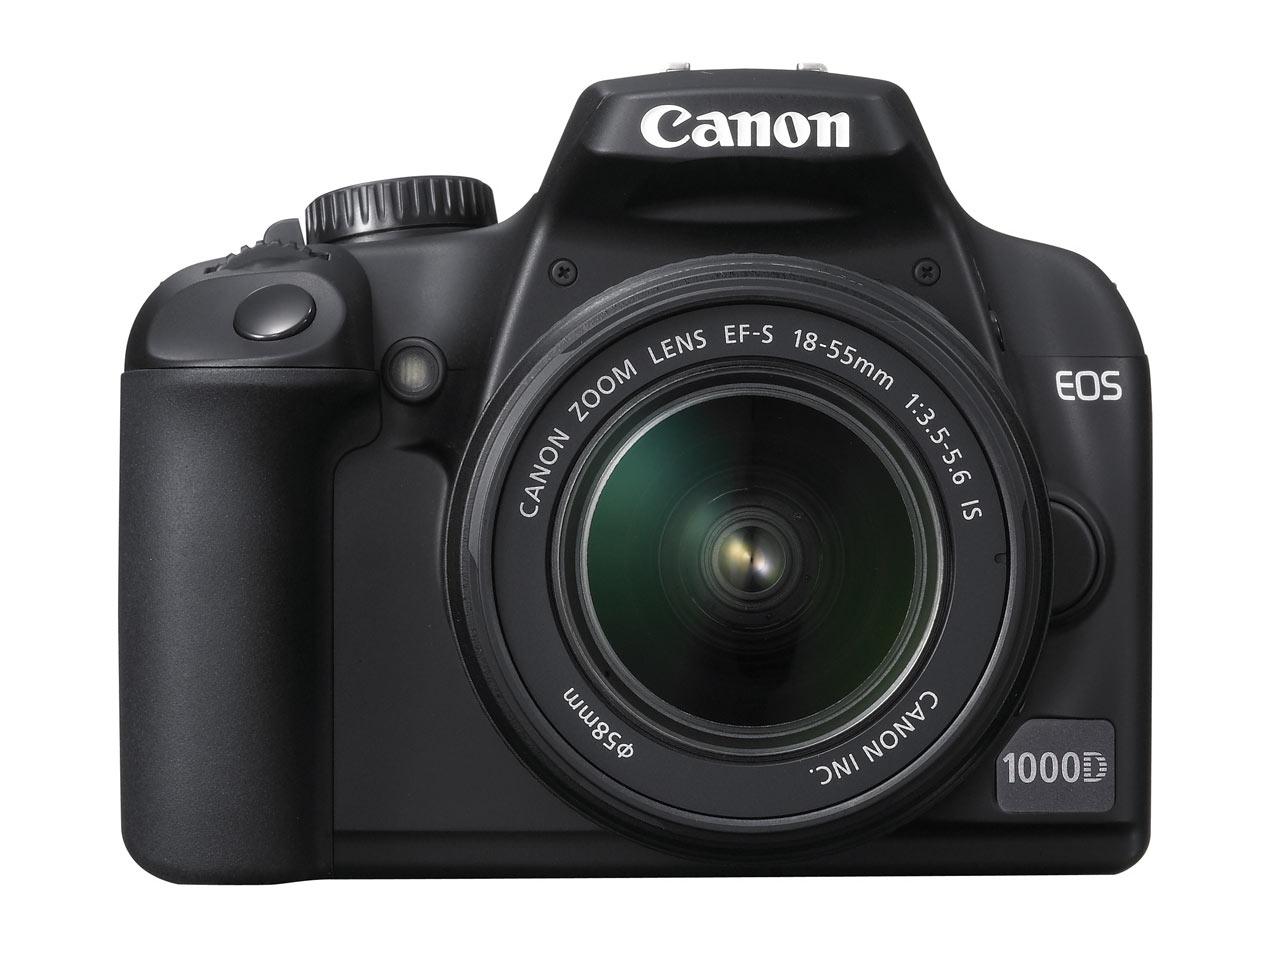 Amstelveen, The Netherlands, 10 June 2008: Canon today announces its latest  D-SLR, the EOS 1000D. Featuring a 10.1 Megapixel CMOS sensor, 7-point wide  area ...